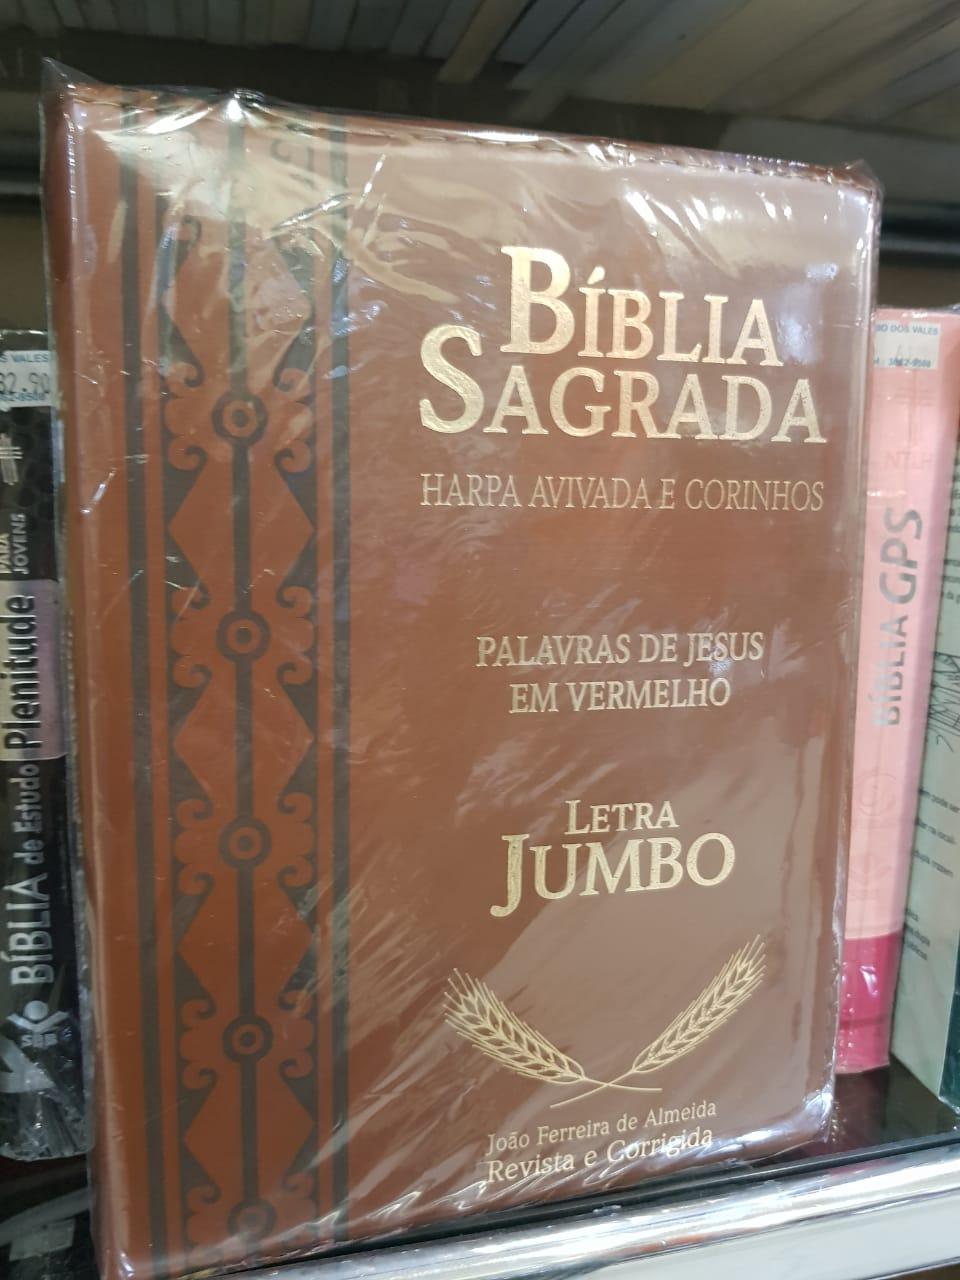 Bíblia letra jumbo com zíper